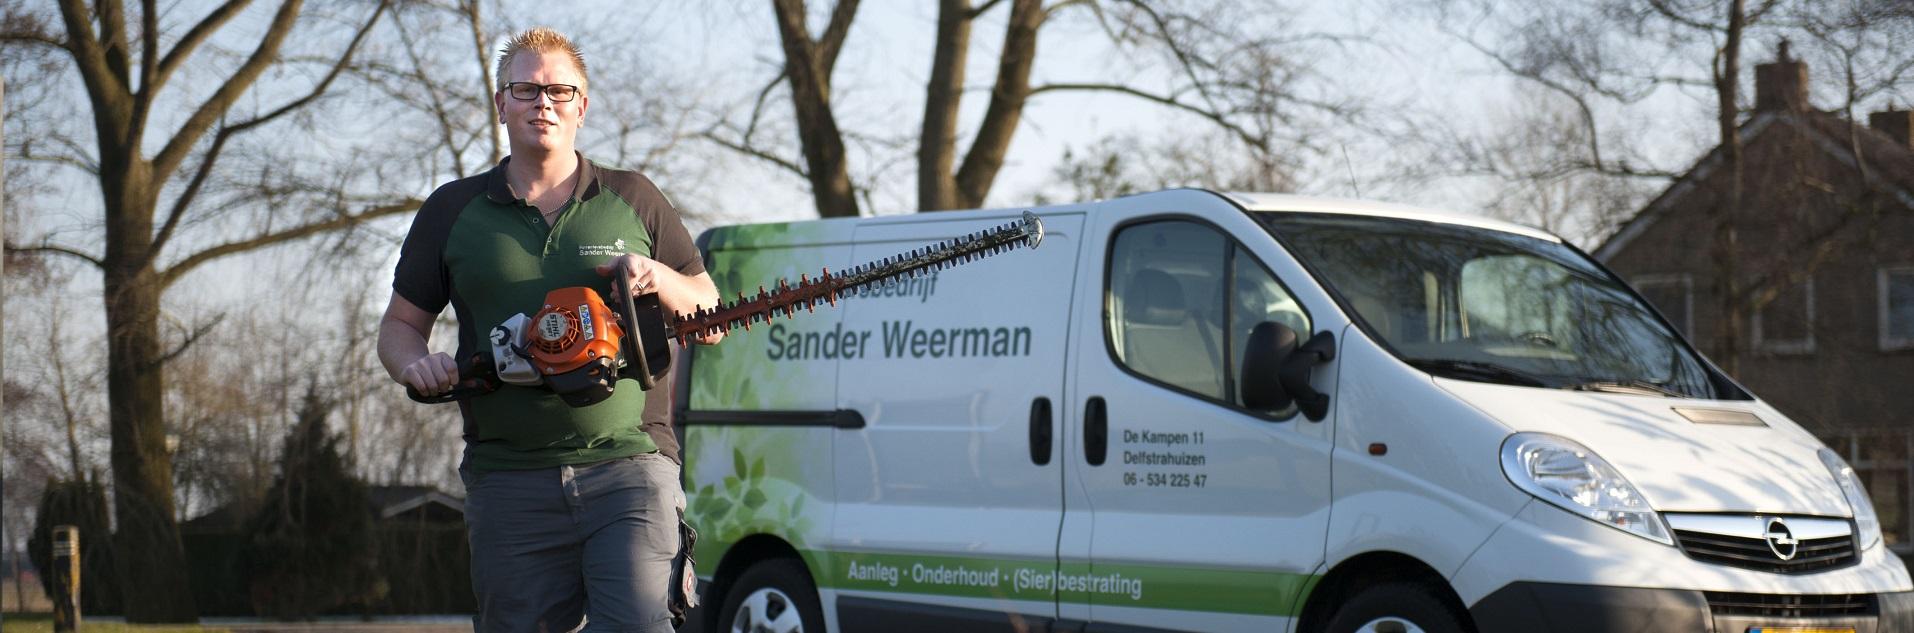 Sander Weerman Hovenier